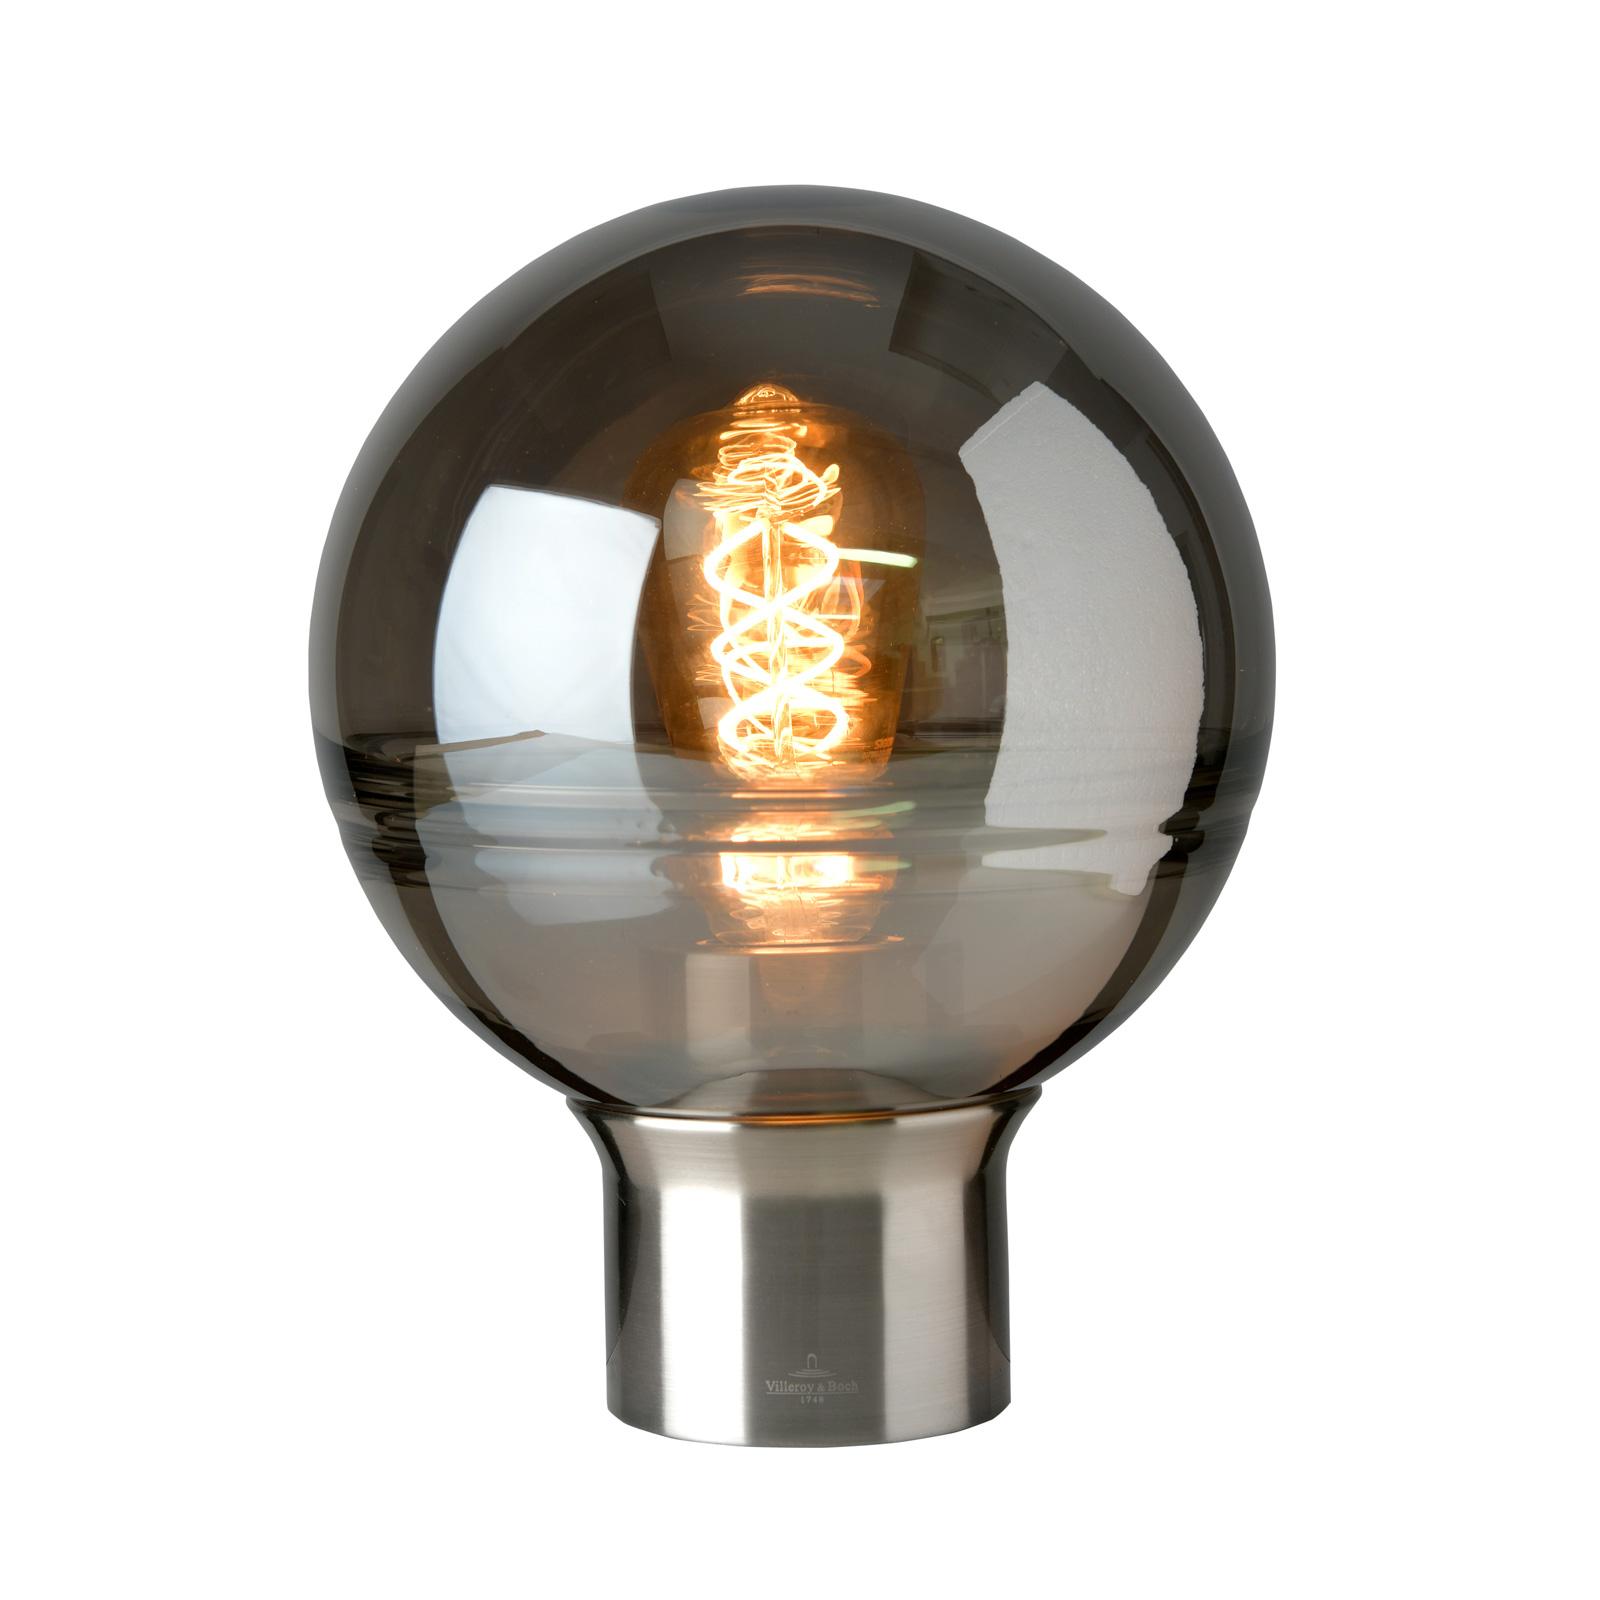 Villeroy & Boch Tokio tafellamp, satijn Ø 20 cm